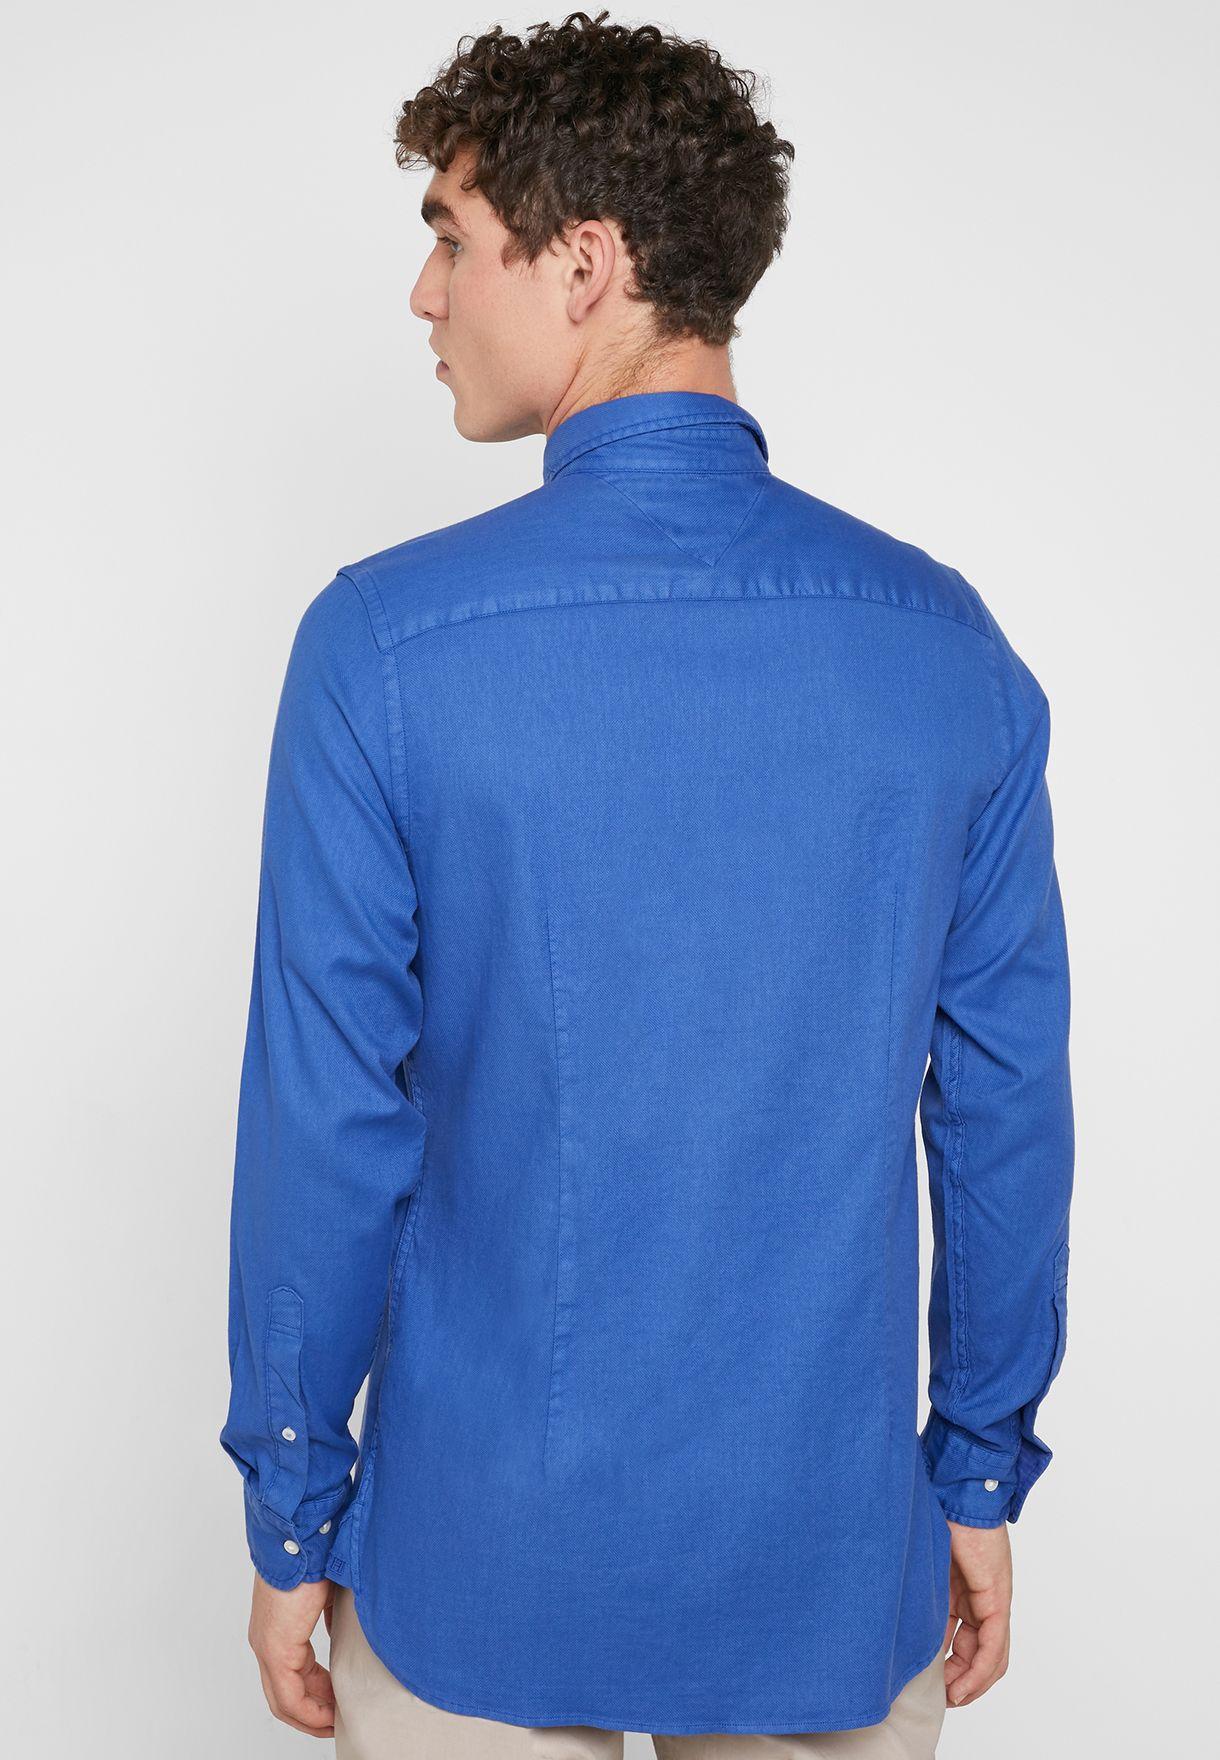 Garment Dyed Slim Fit Shirt